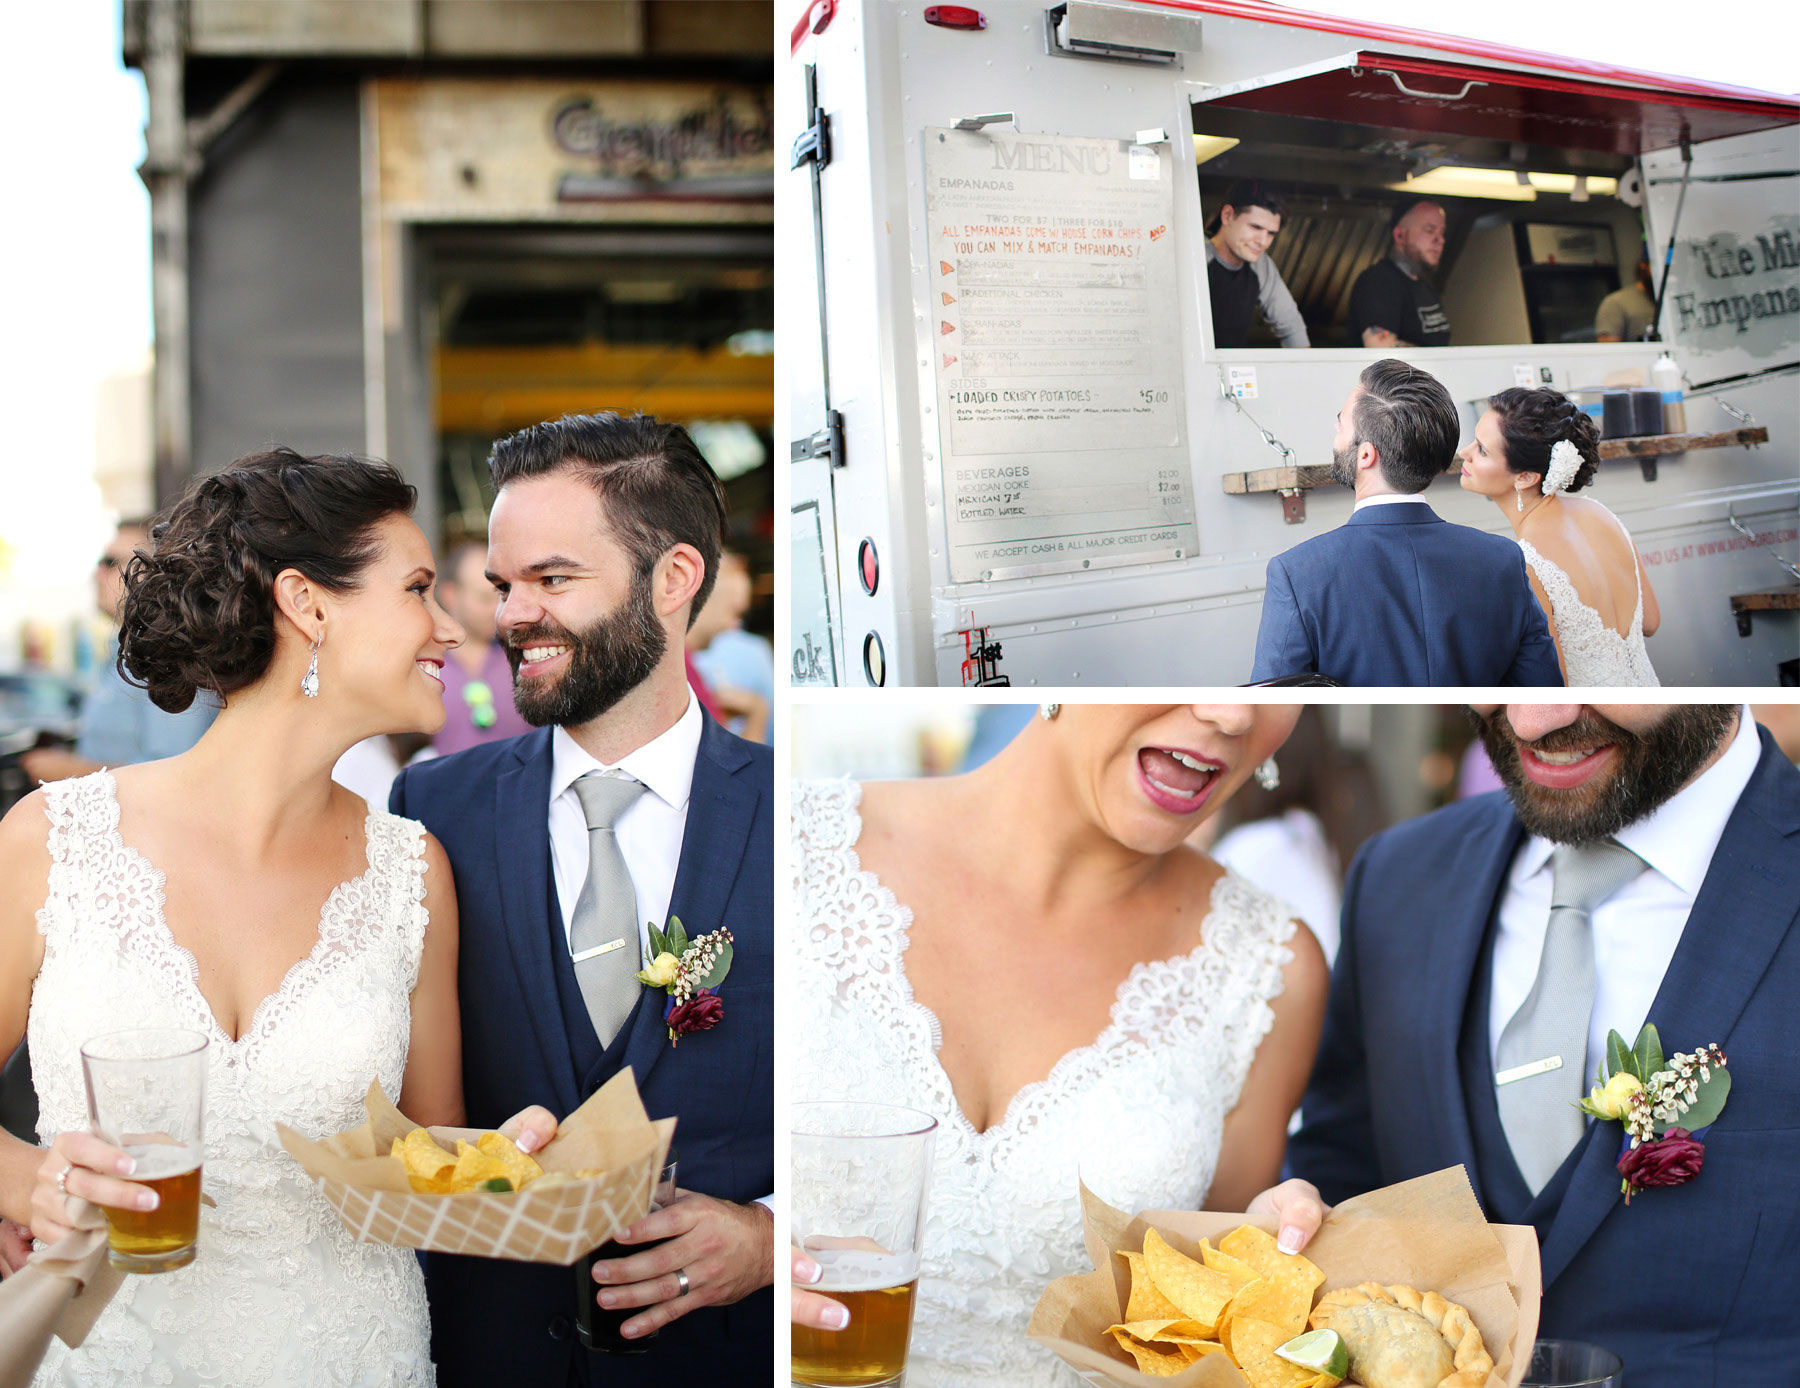 18-Minneapolis-Minnesota-Wedding-Photographer-by-Andrew-Vick-Photography-Summer-Bauhaus-Brew-Labs-Brewery-MidNord-Empanada-Truck-Bride-Groom-Beer-Drinks-Food-Ashley-and-Eric.jpg